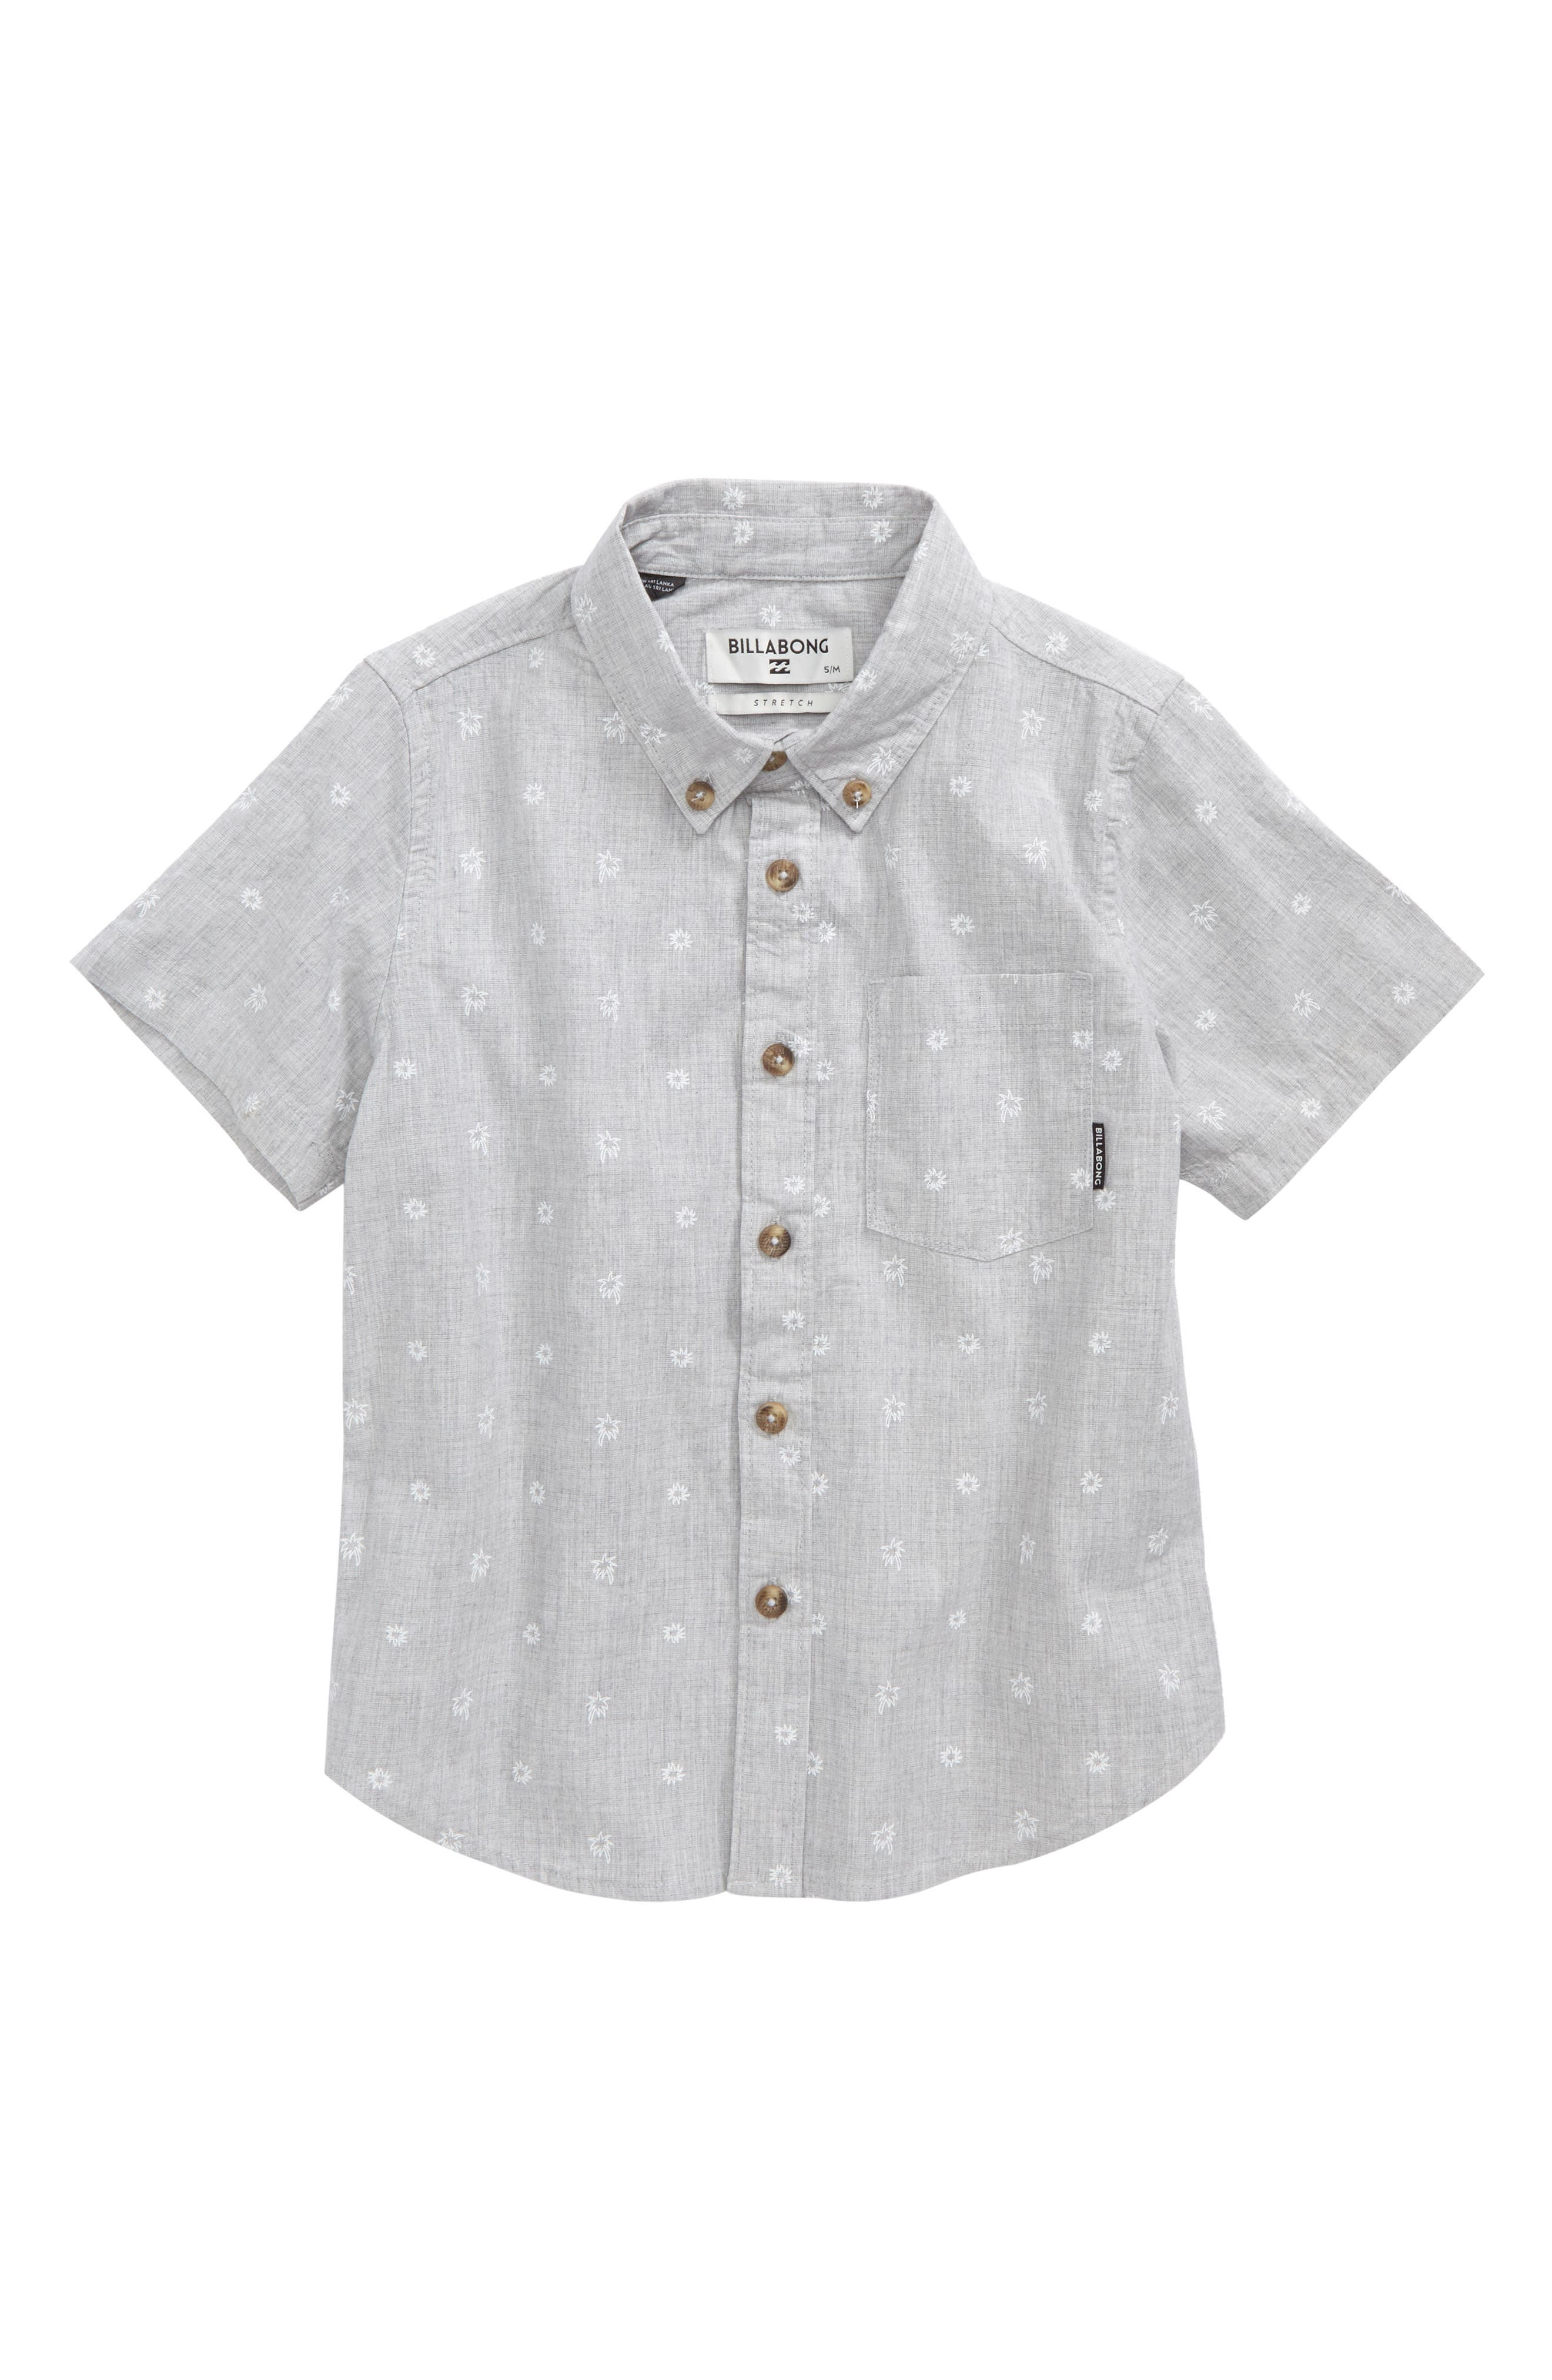 Alternate Image 1 Selected - Billabong Sundays Mini Woven Shirt (Toddler Boys & Little Boys)